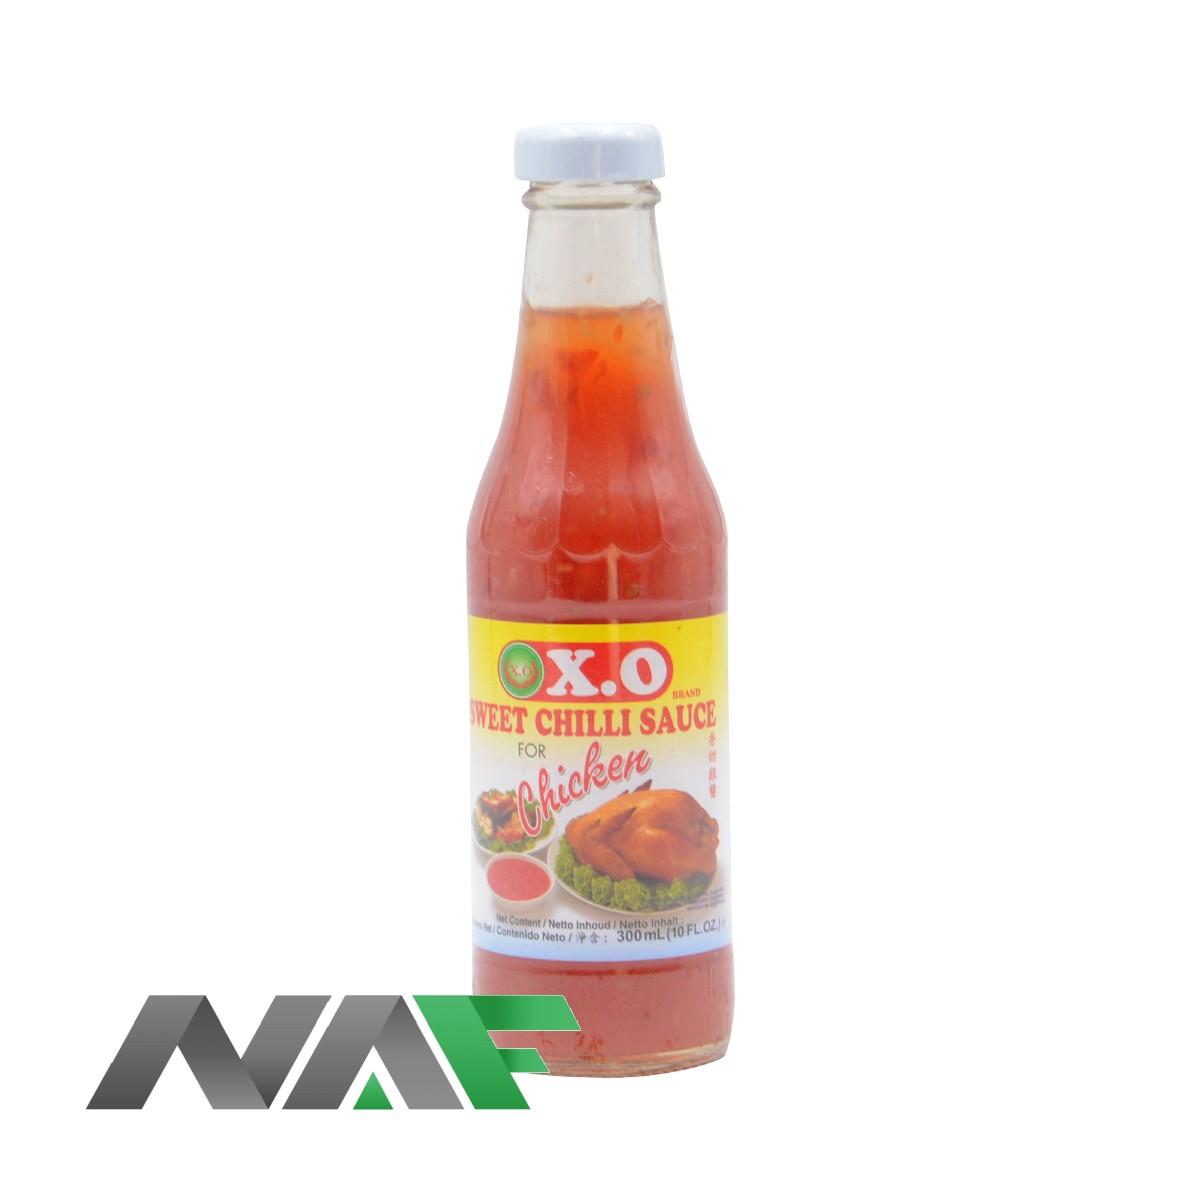 Sweet Chili Sauce X O 300ml